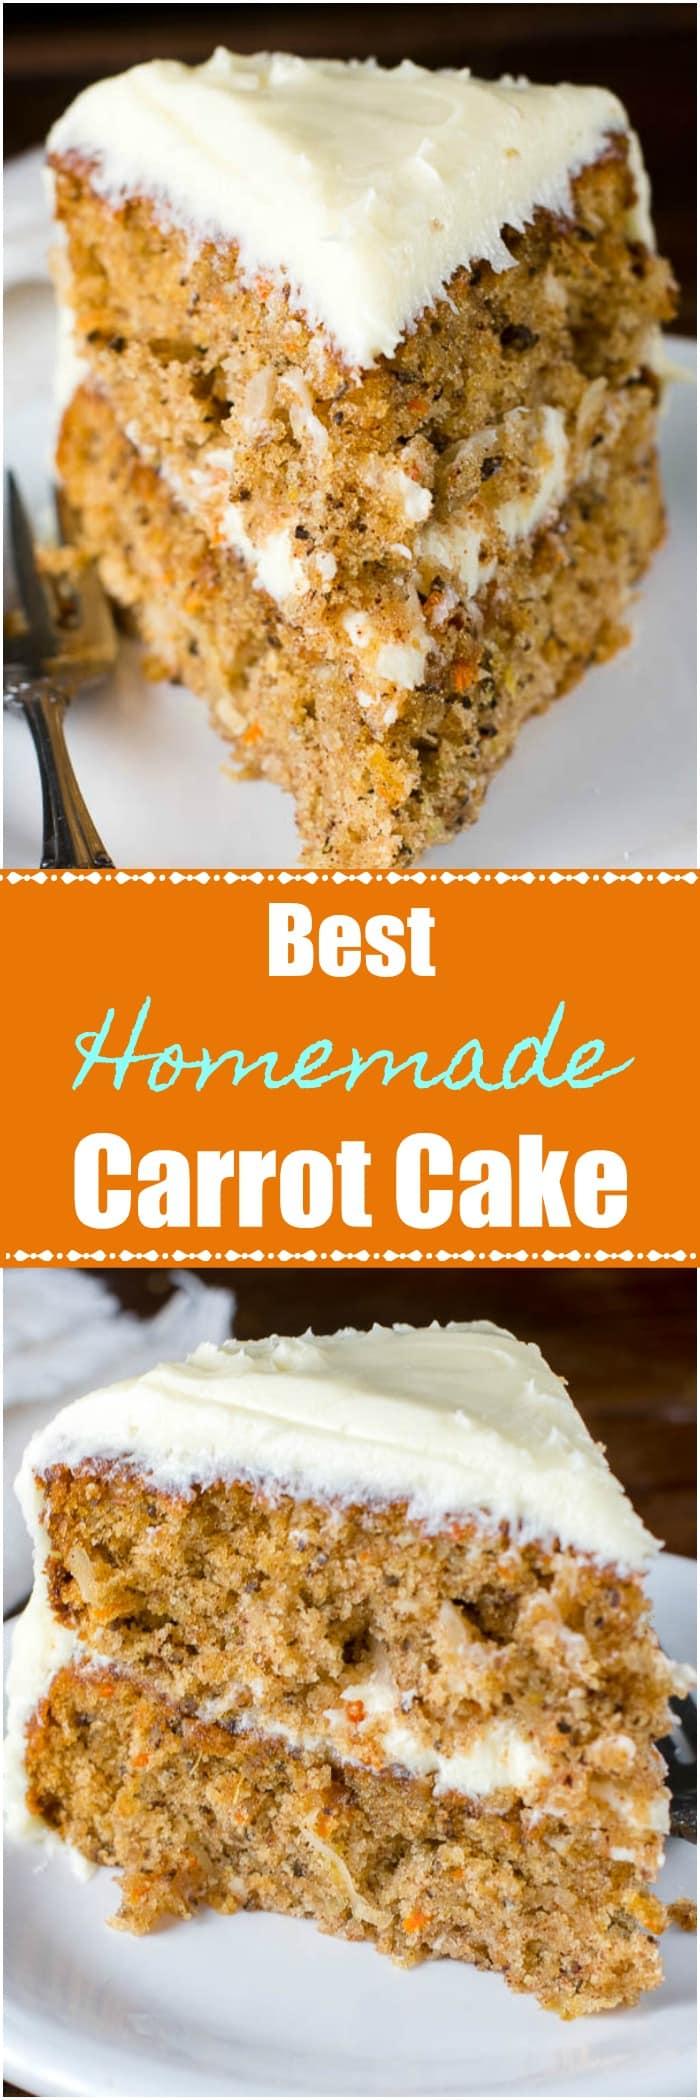 Best Homemade Carrot Cake Recipe Log pin